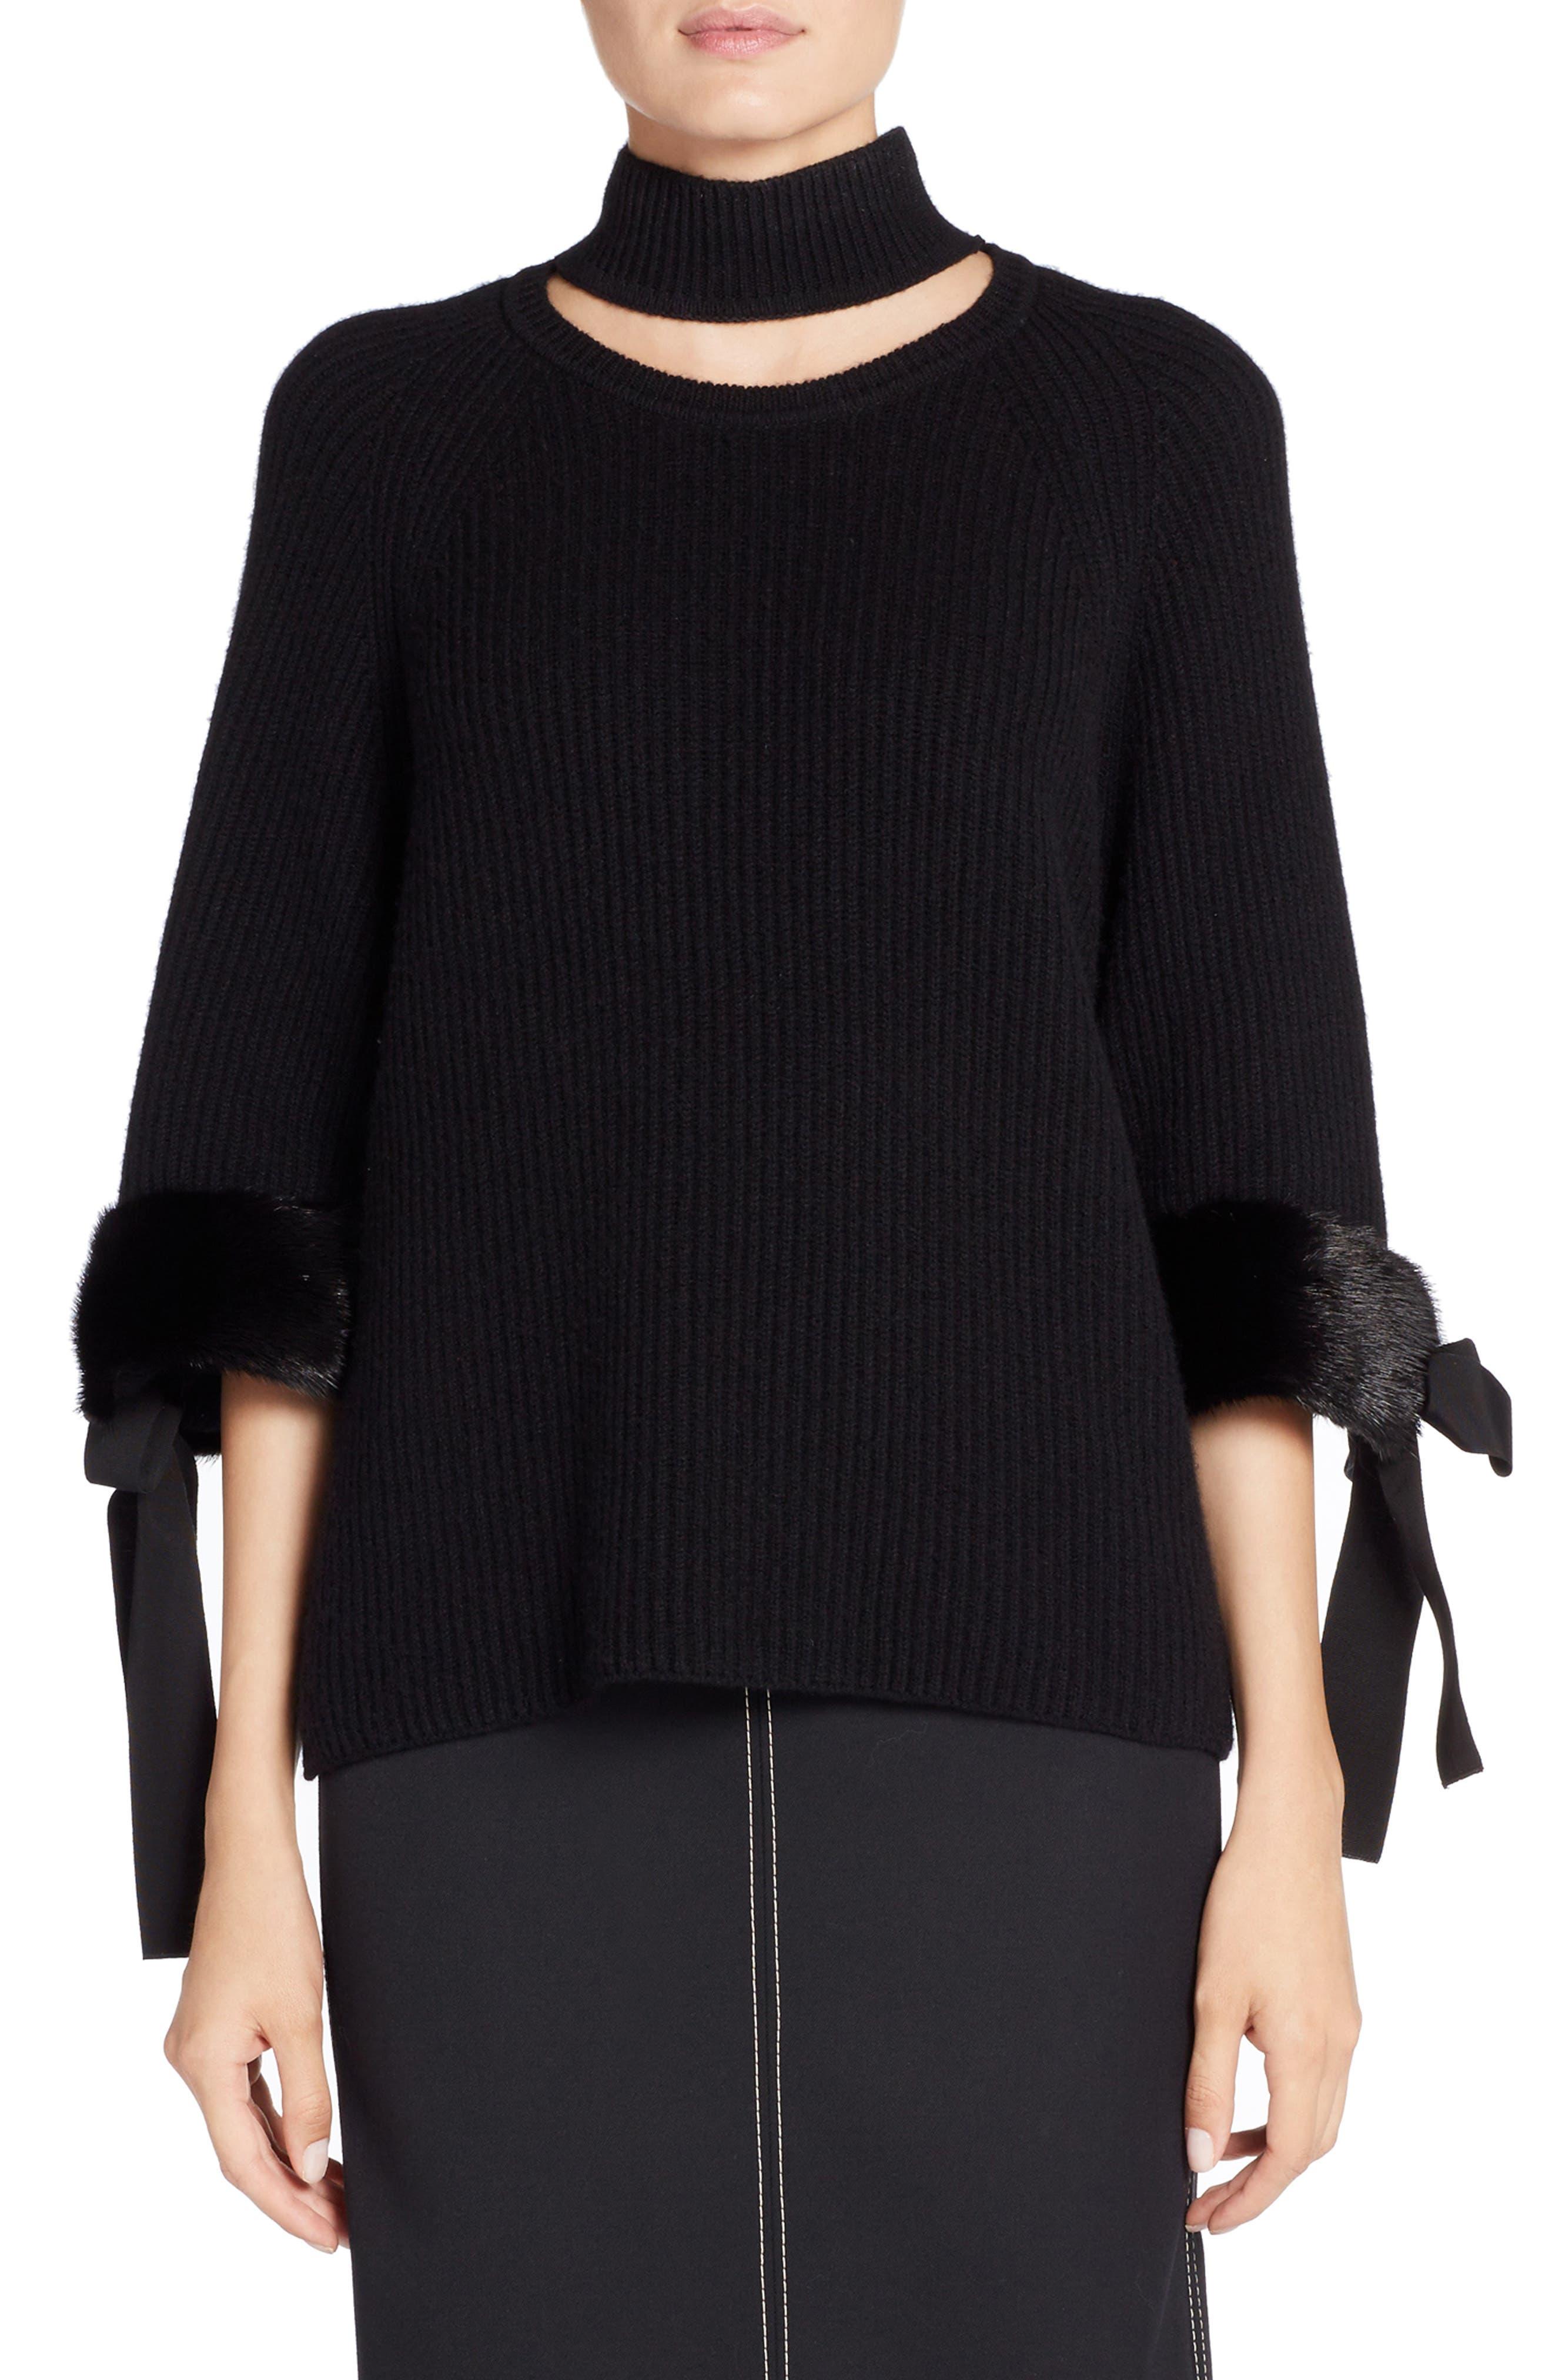 Main Image - Fendi Cashmere & Genuine Mink Fur Sweater